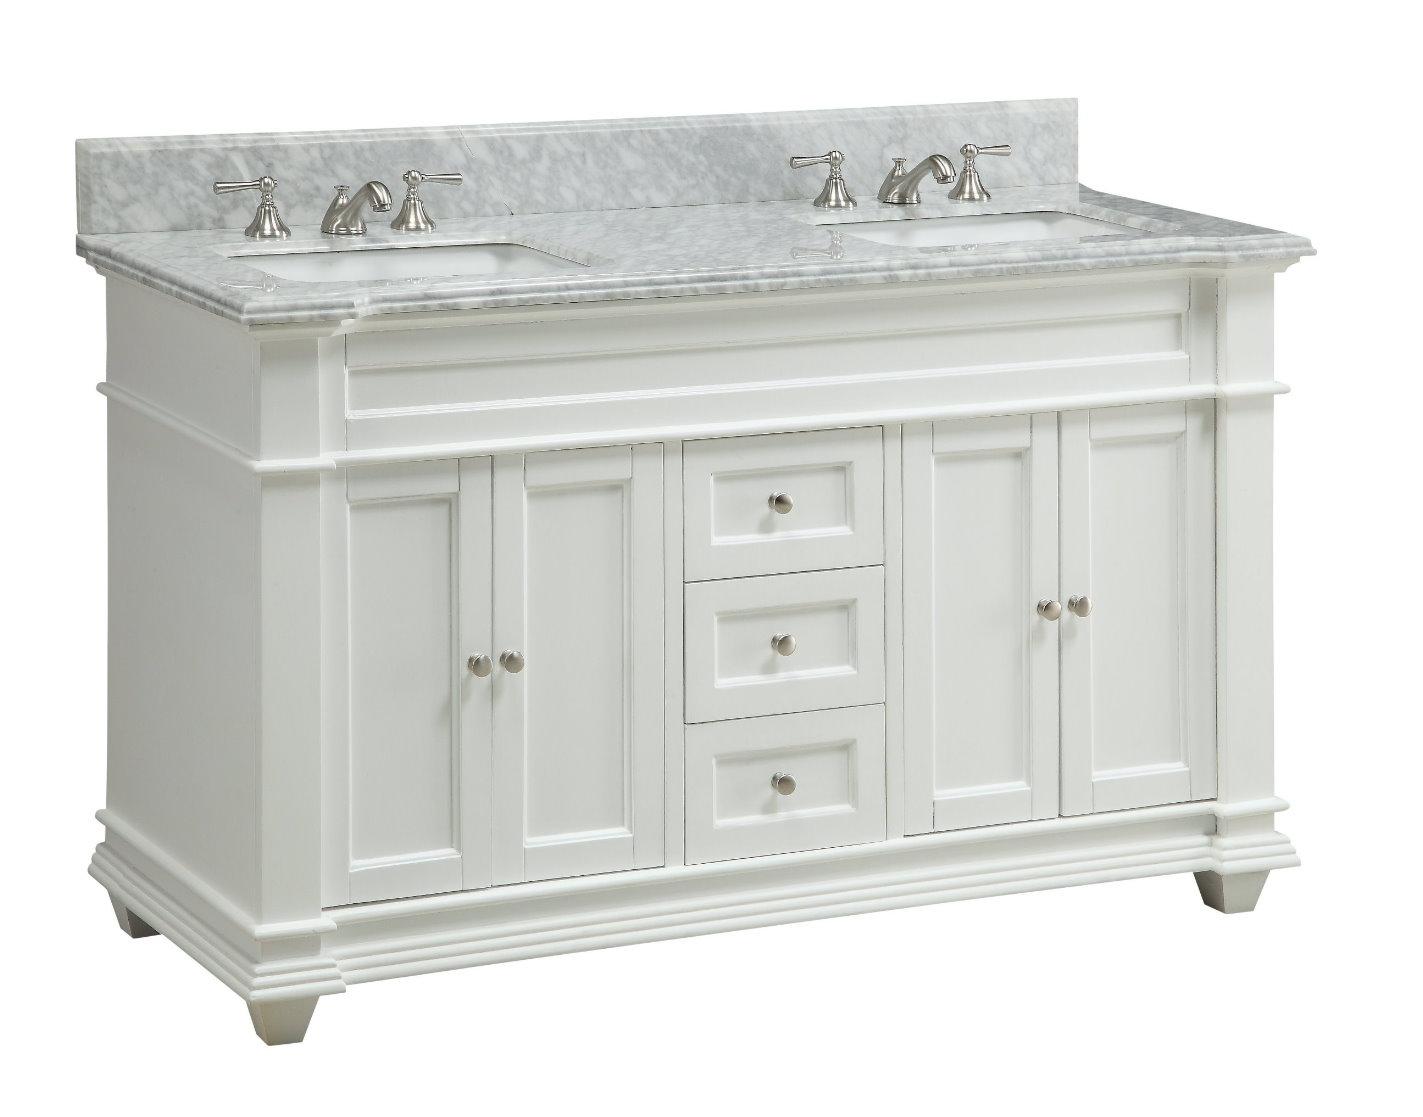 Adelina 60 inch Double Sink Bathroom Vanity White Finish